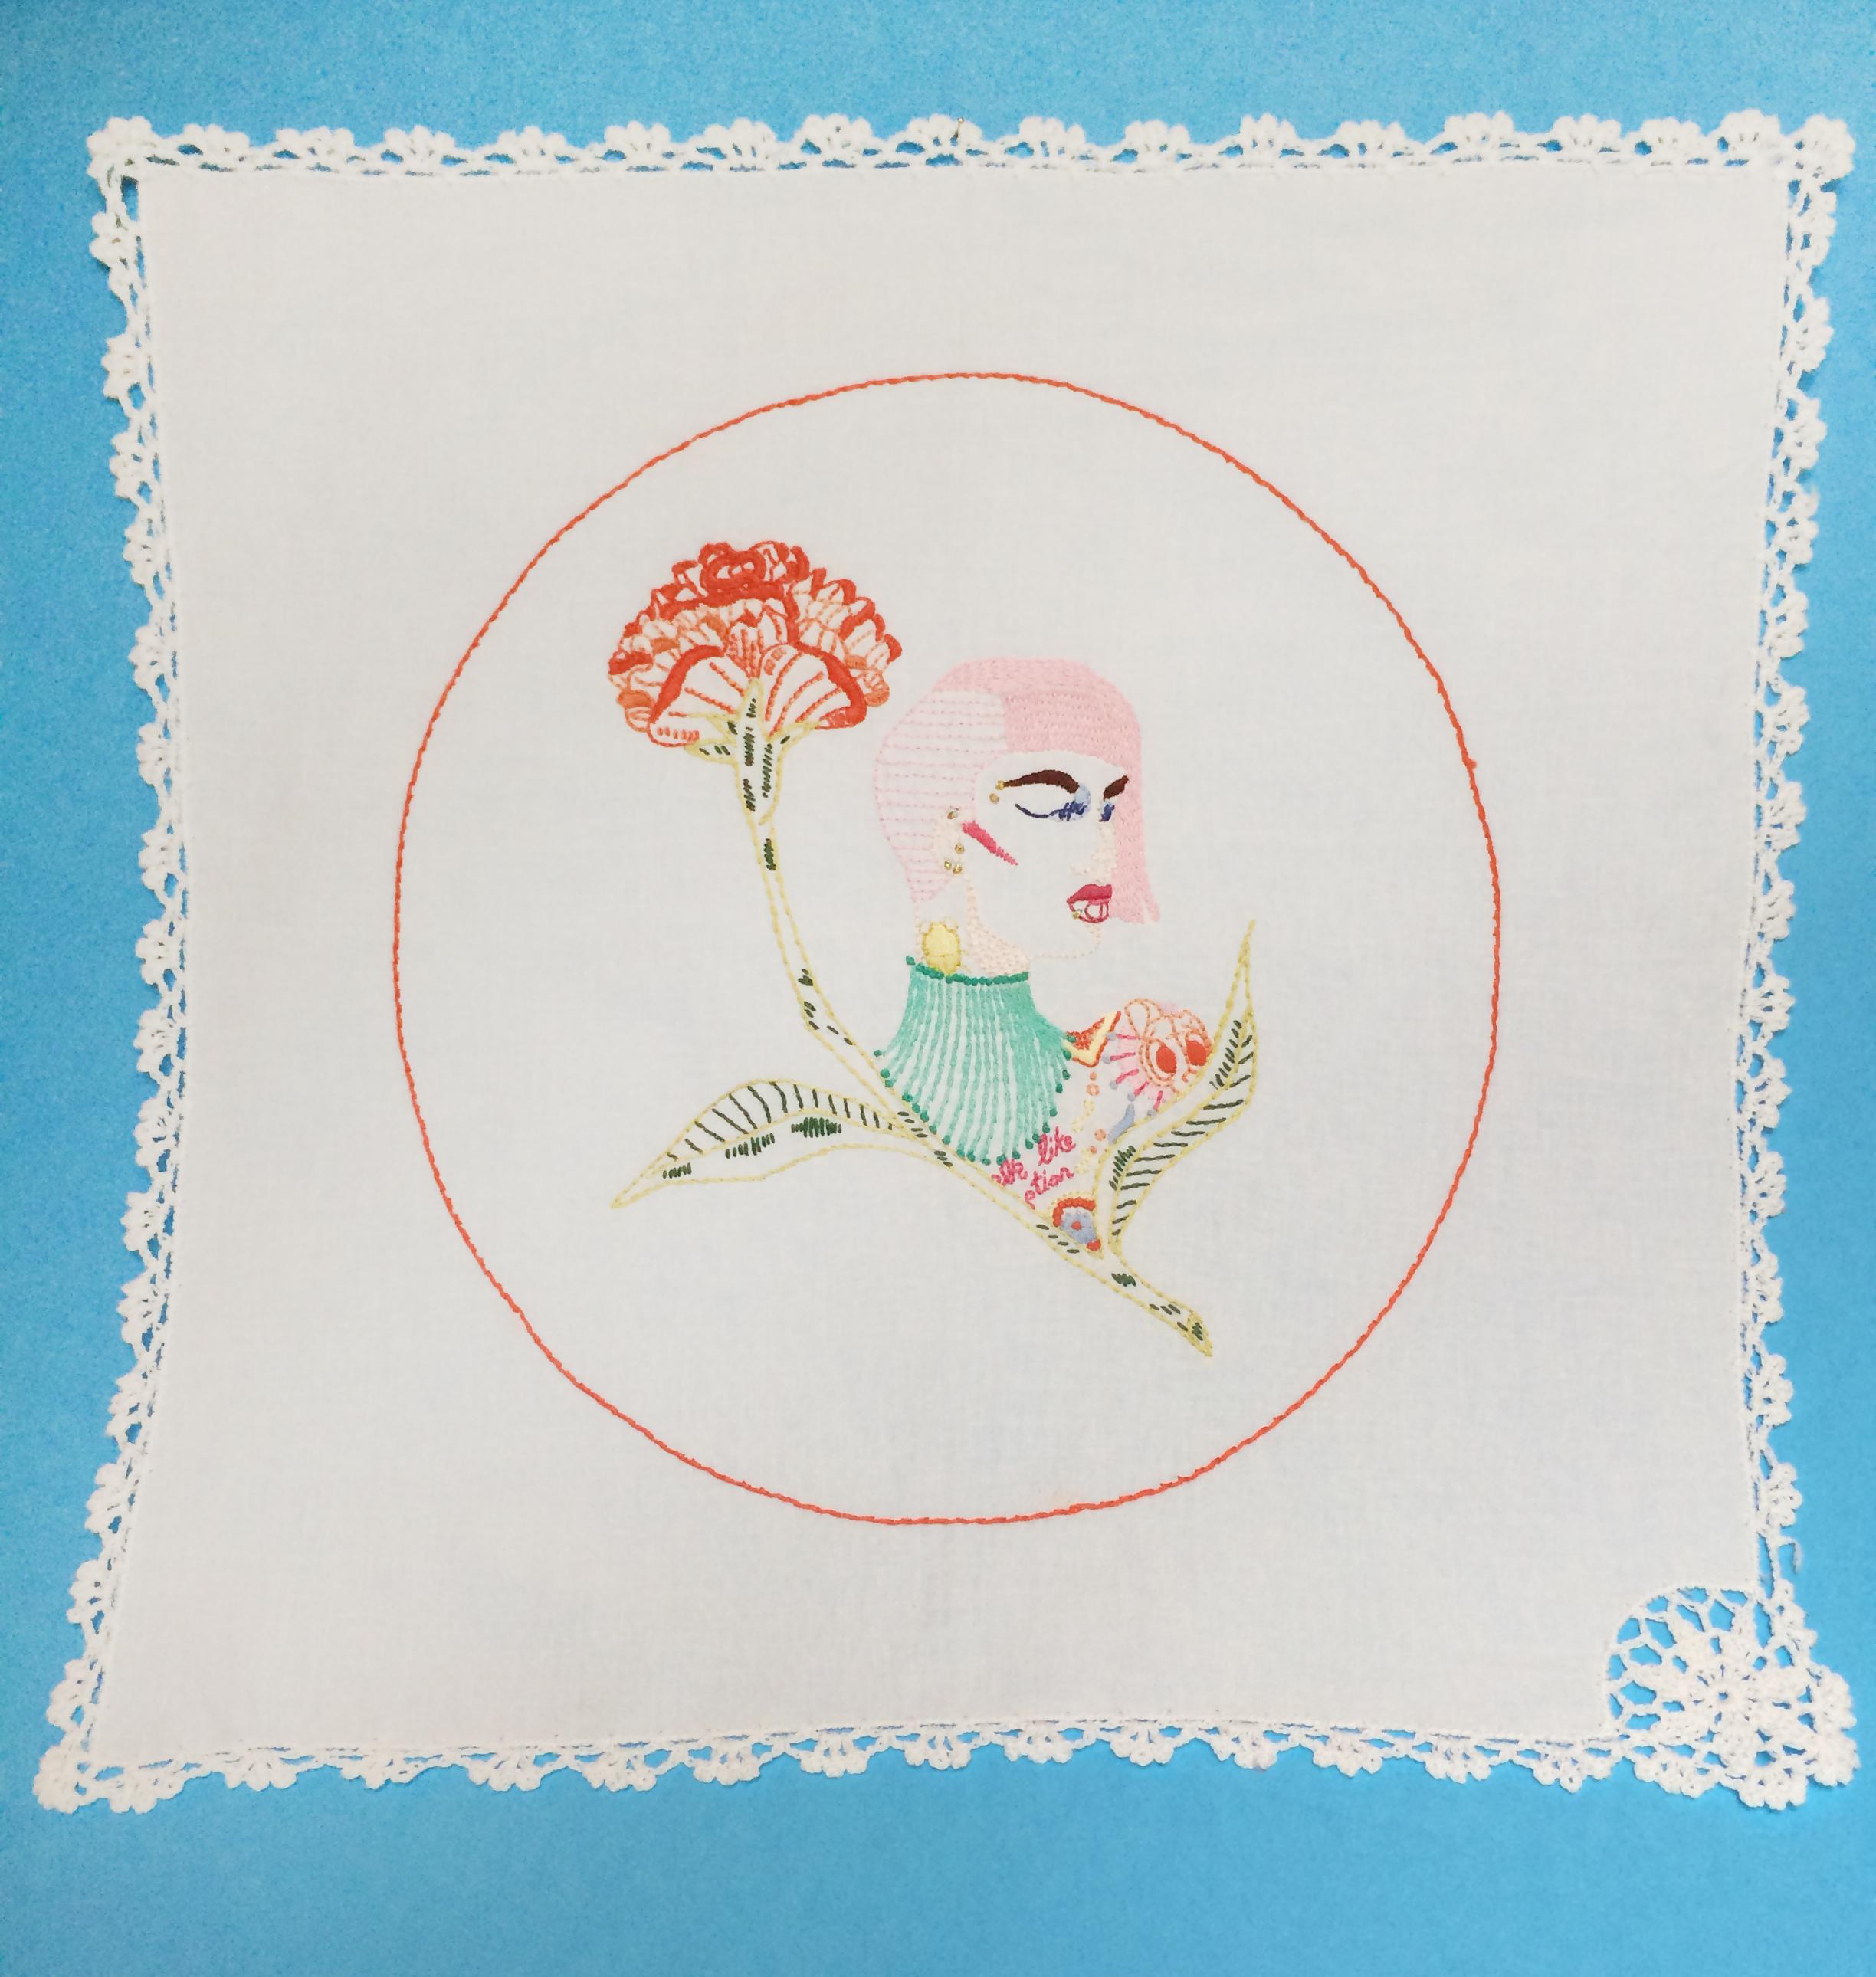 "Nile  ,   Embroidered Illustration on Vintage Lace. 17""x17""  . 2015."